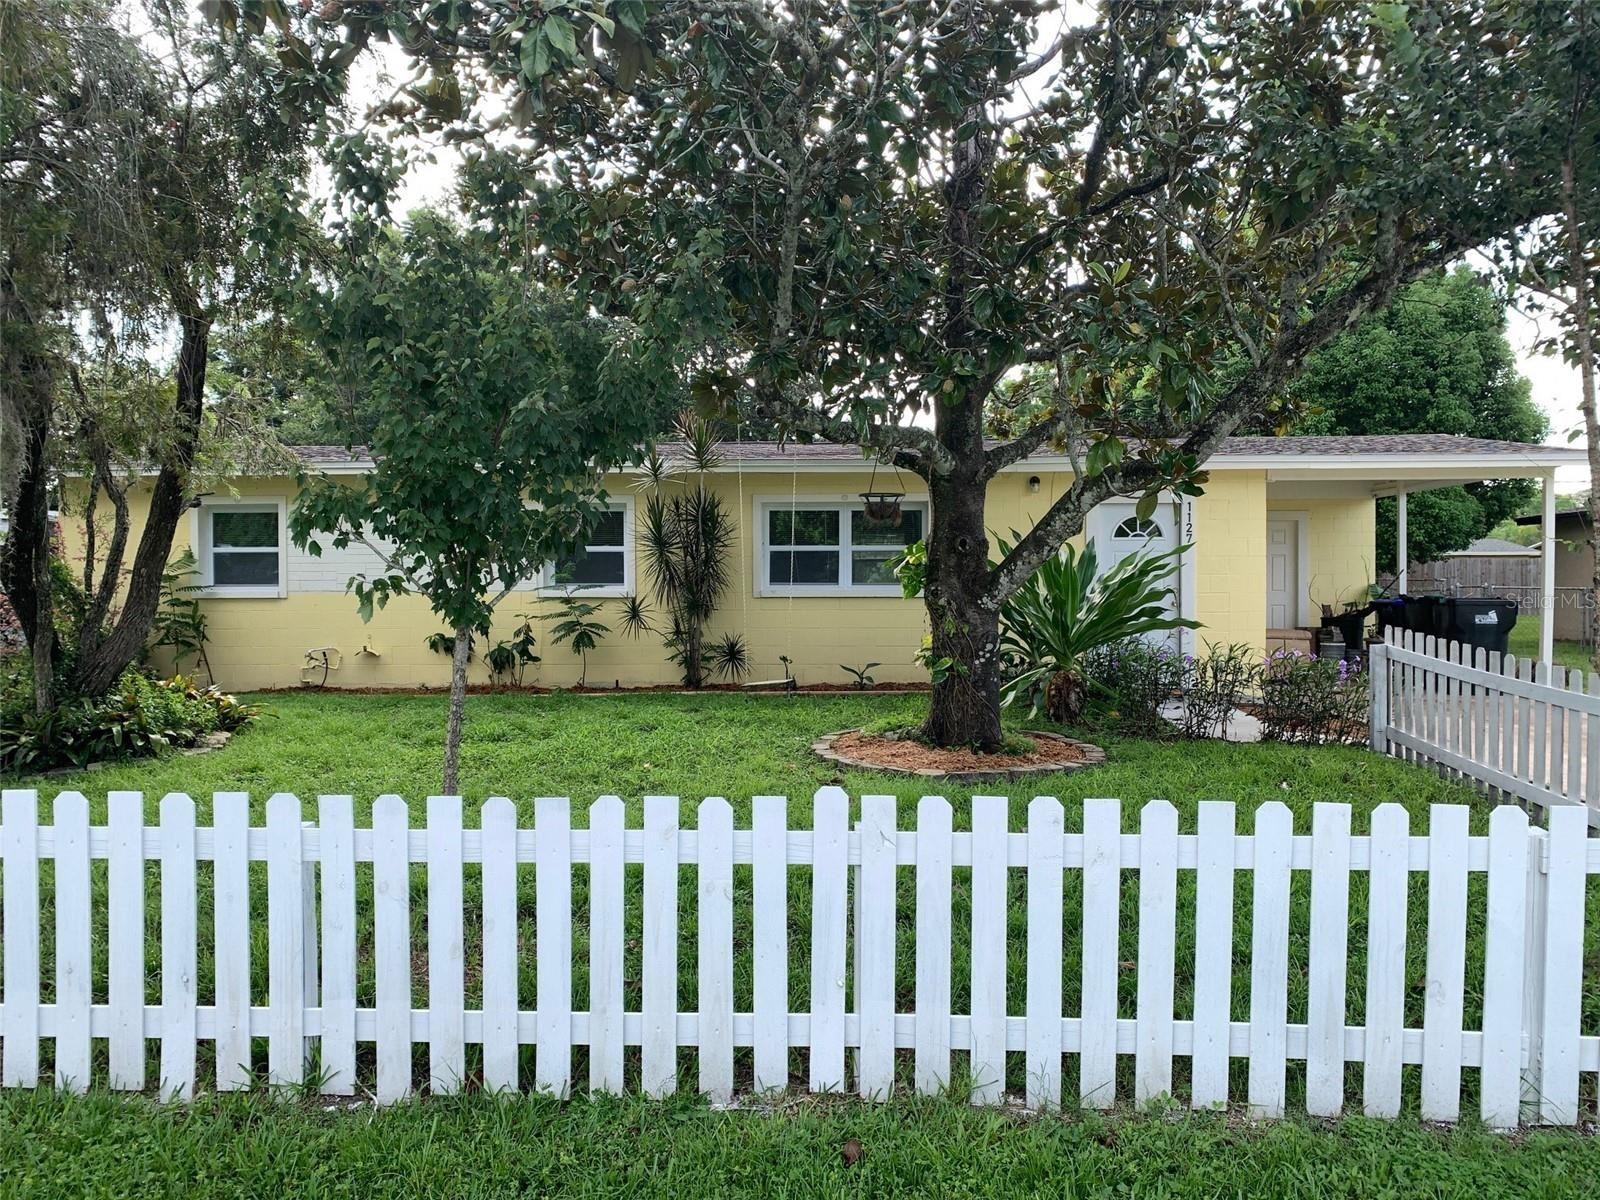 1127 NARCISSUS LANE, Orlando, FL 32825 - MLS#: O5961022